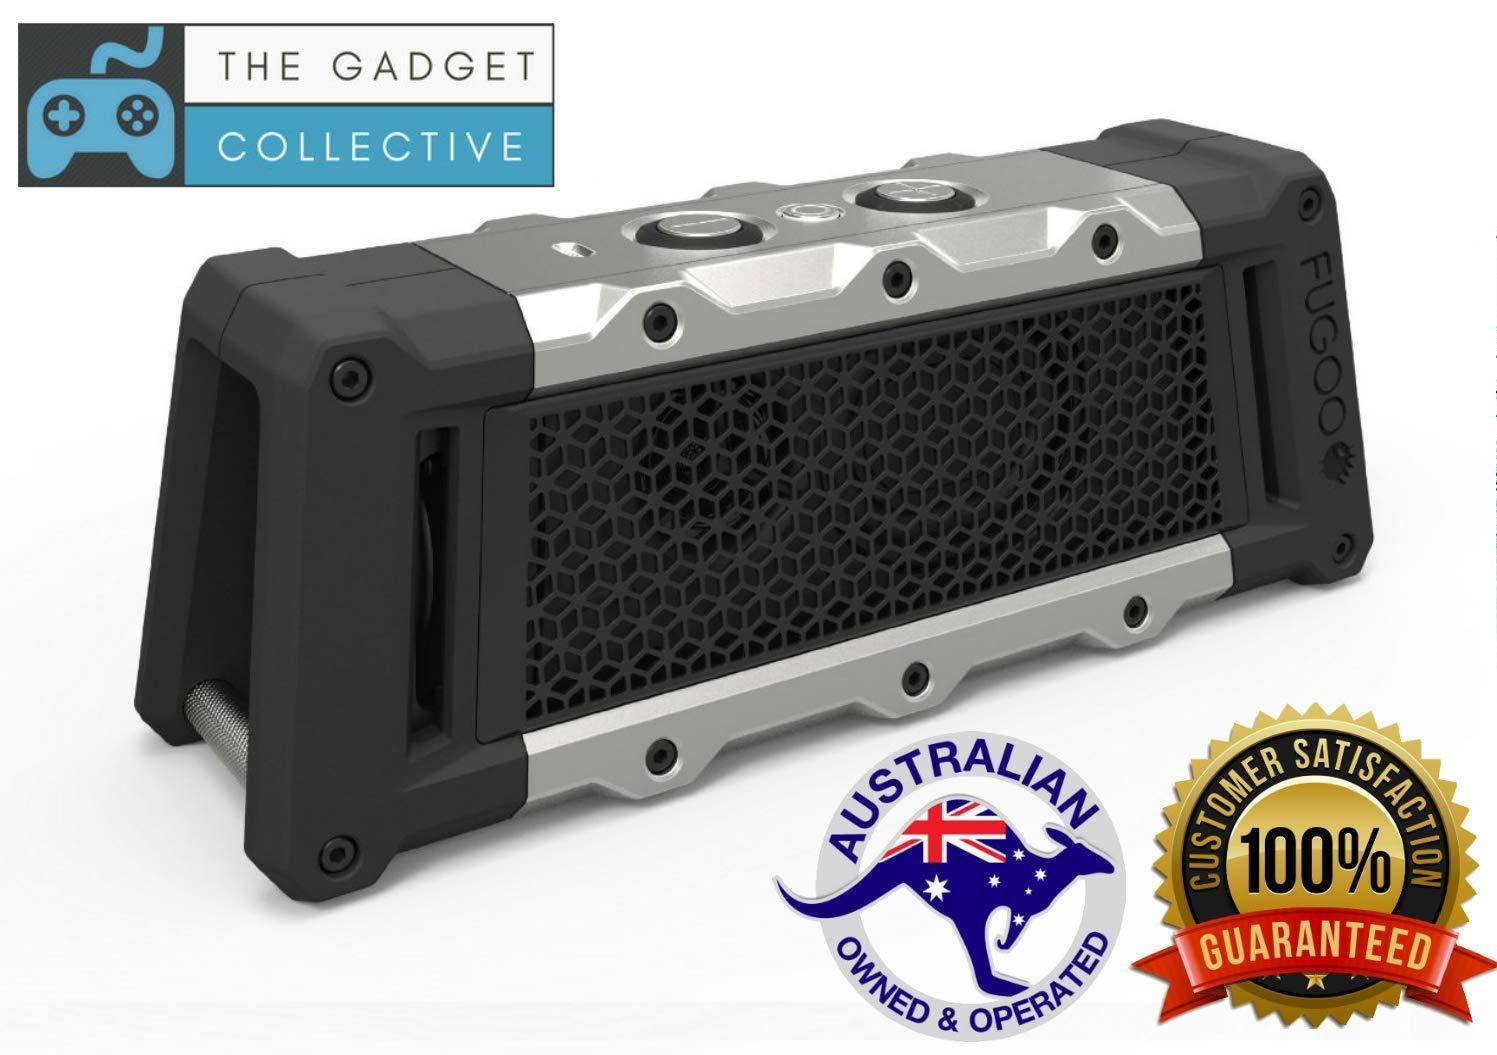 Fugoo Tough – ポータブル、防水性、Rugged BluetoothワイヤレスGo Anywhereスピーカー B00YJHWLZC